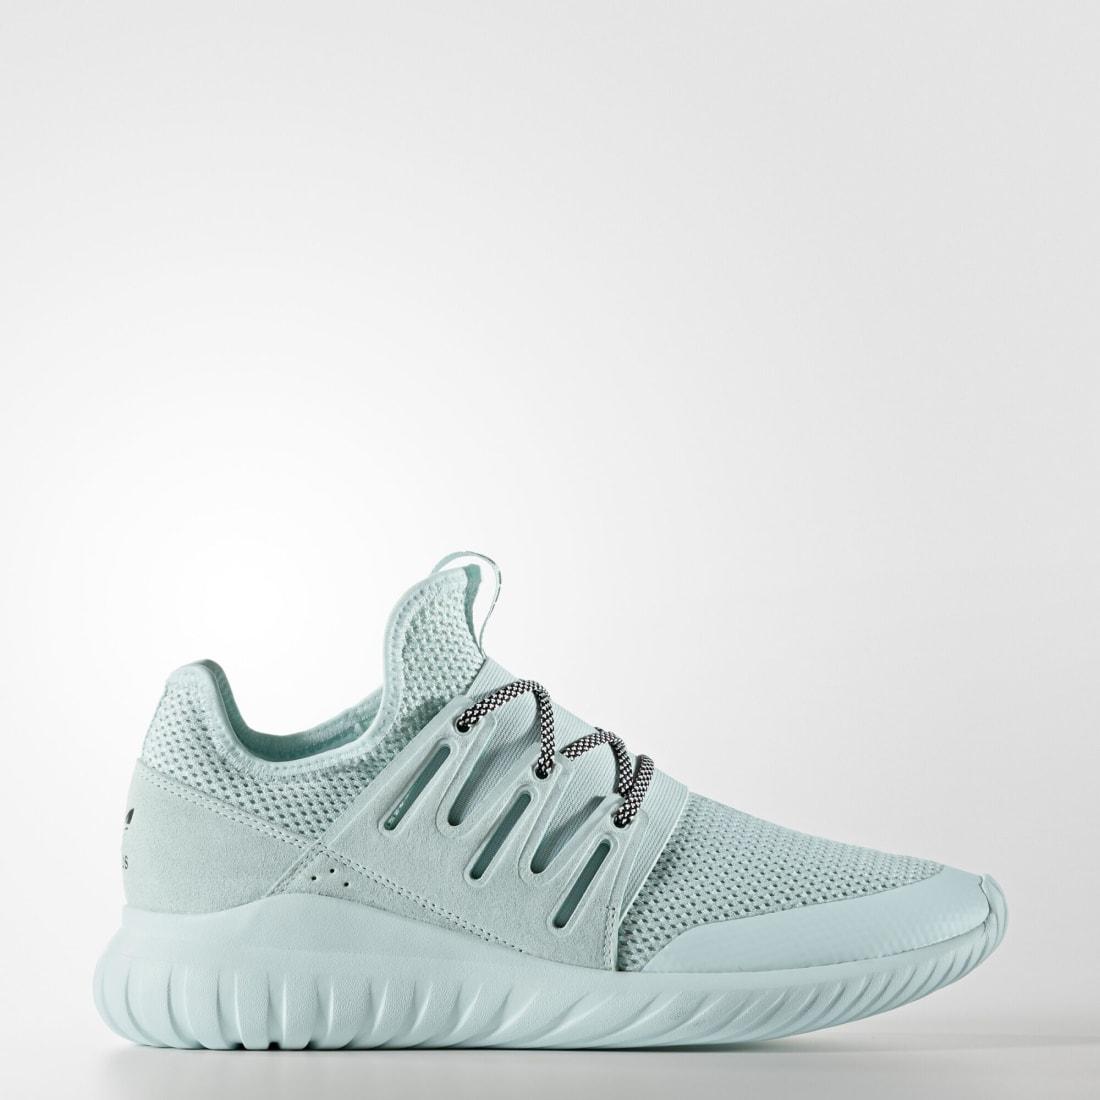 adidas Tubular Radial Ice Mint | Adidas